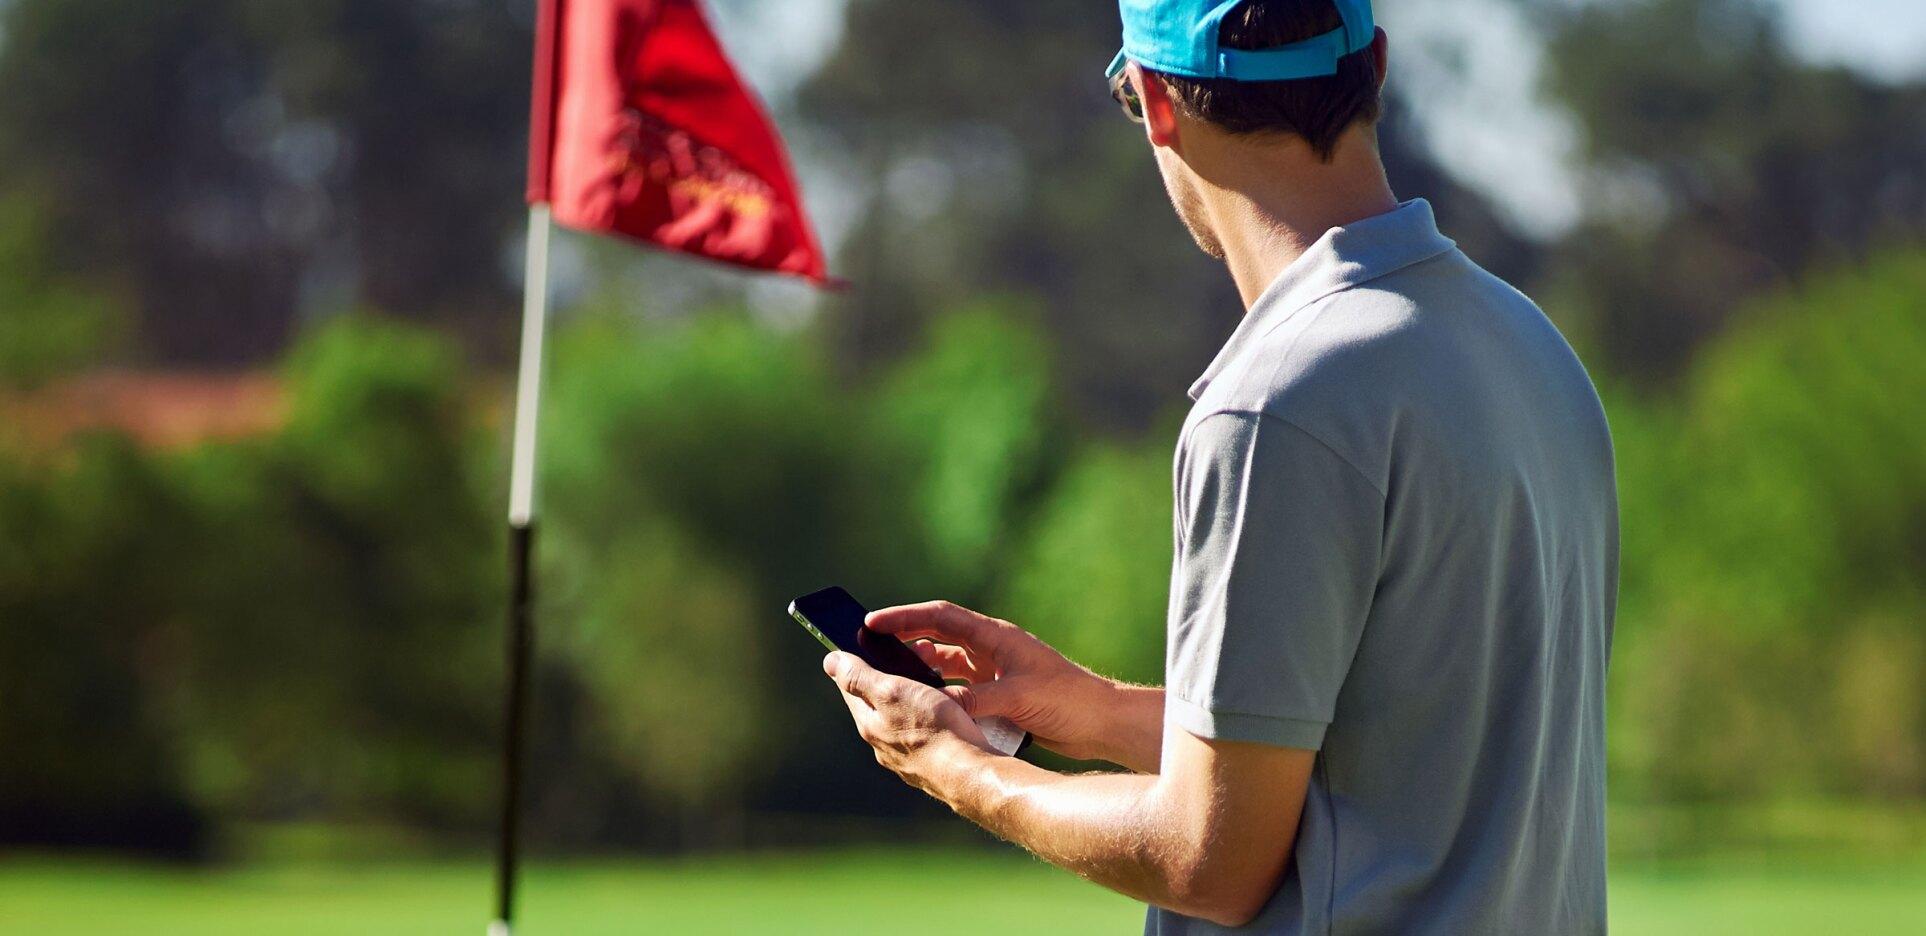 Mobile Phone, Mobile Golf App